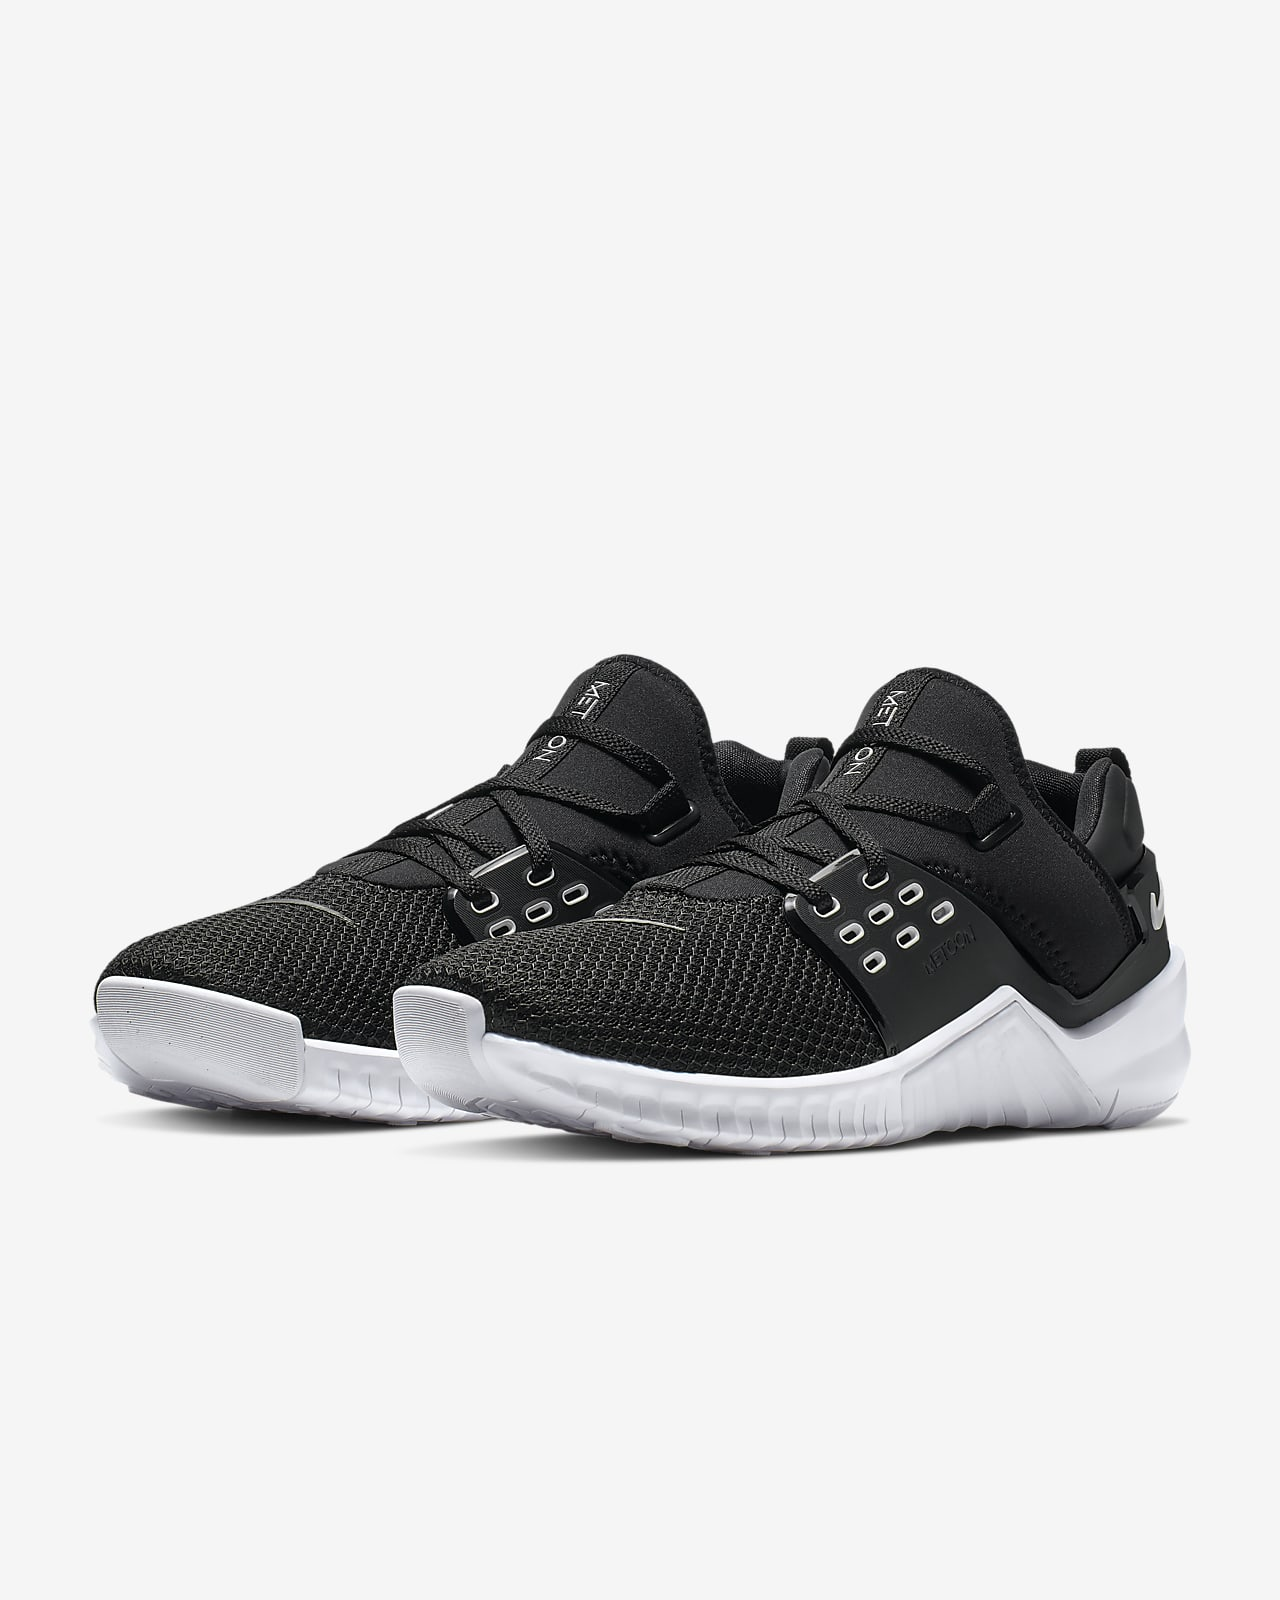 X Metcon 2 Men's Training Shoe. Nike SG